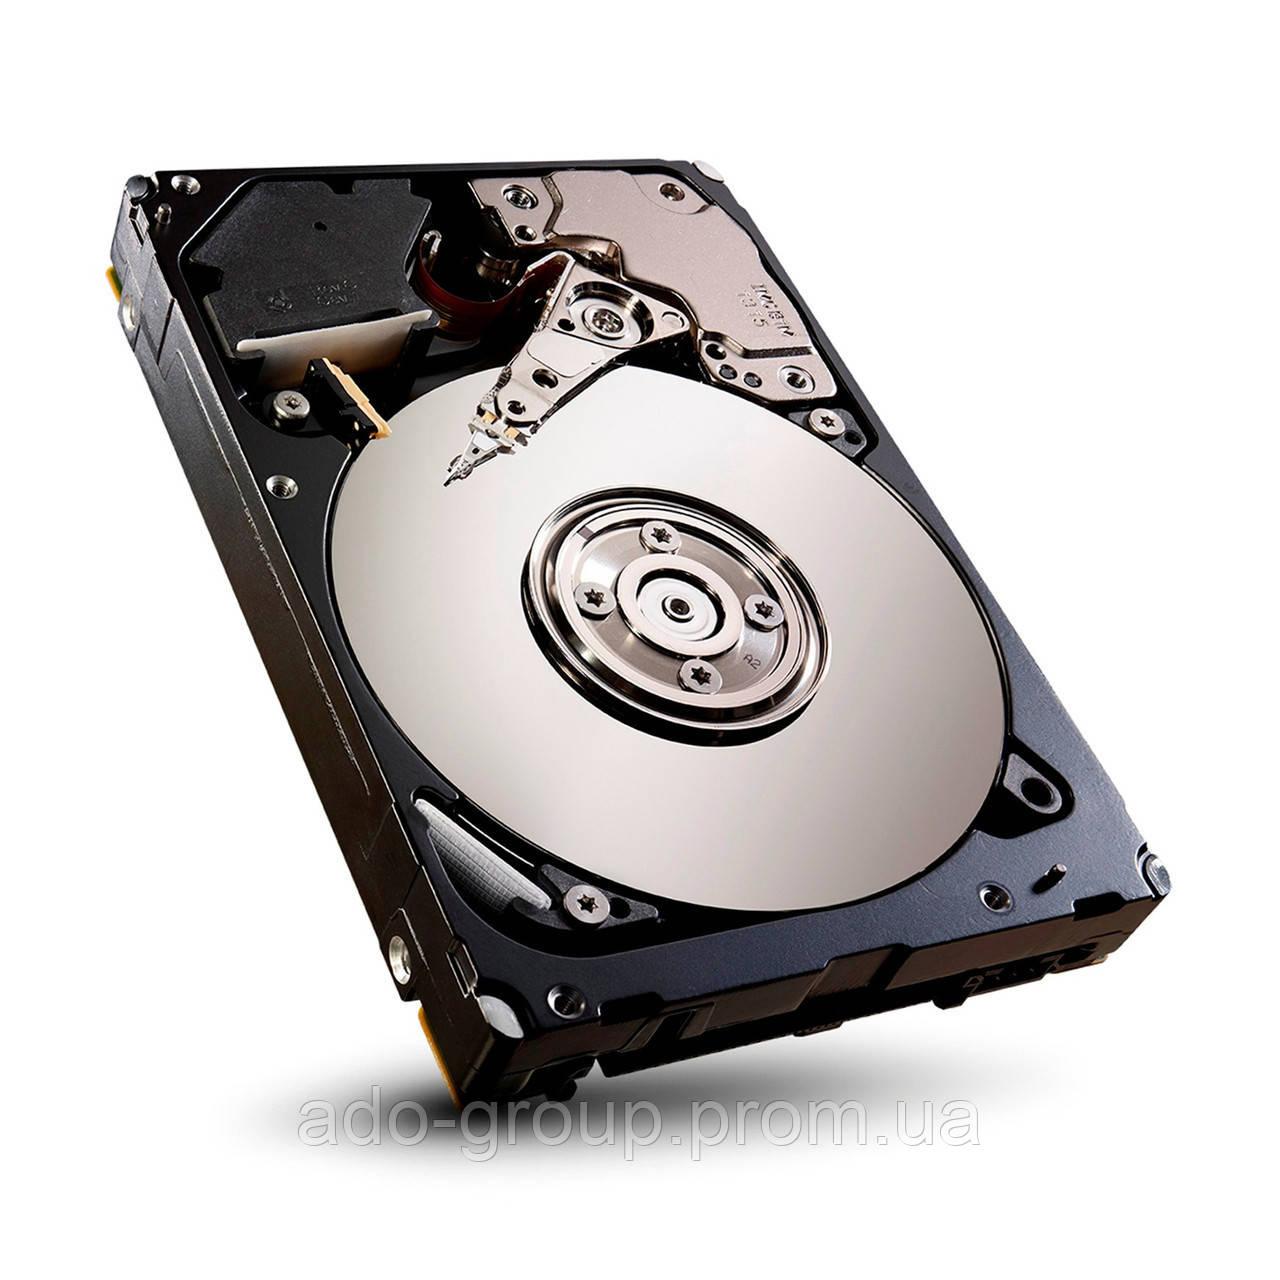 "K6DPT Жесткий диск Dell 500GB SATA 7.2K  3.5"" +"